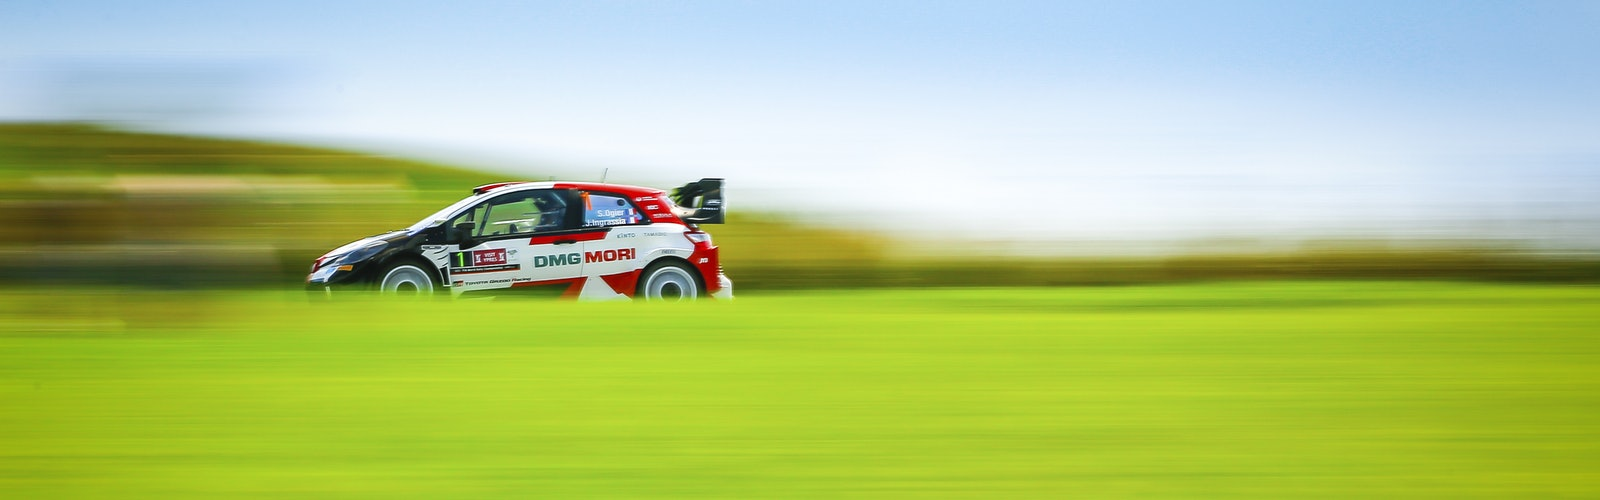 WRC_2021_Rd.9_271